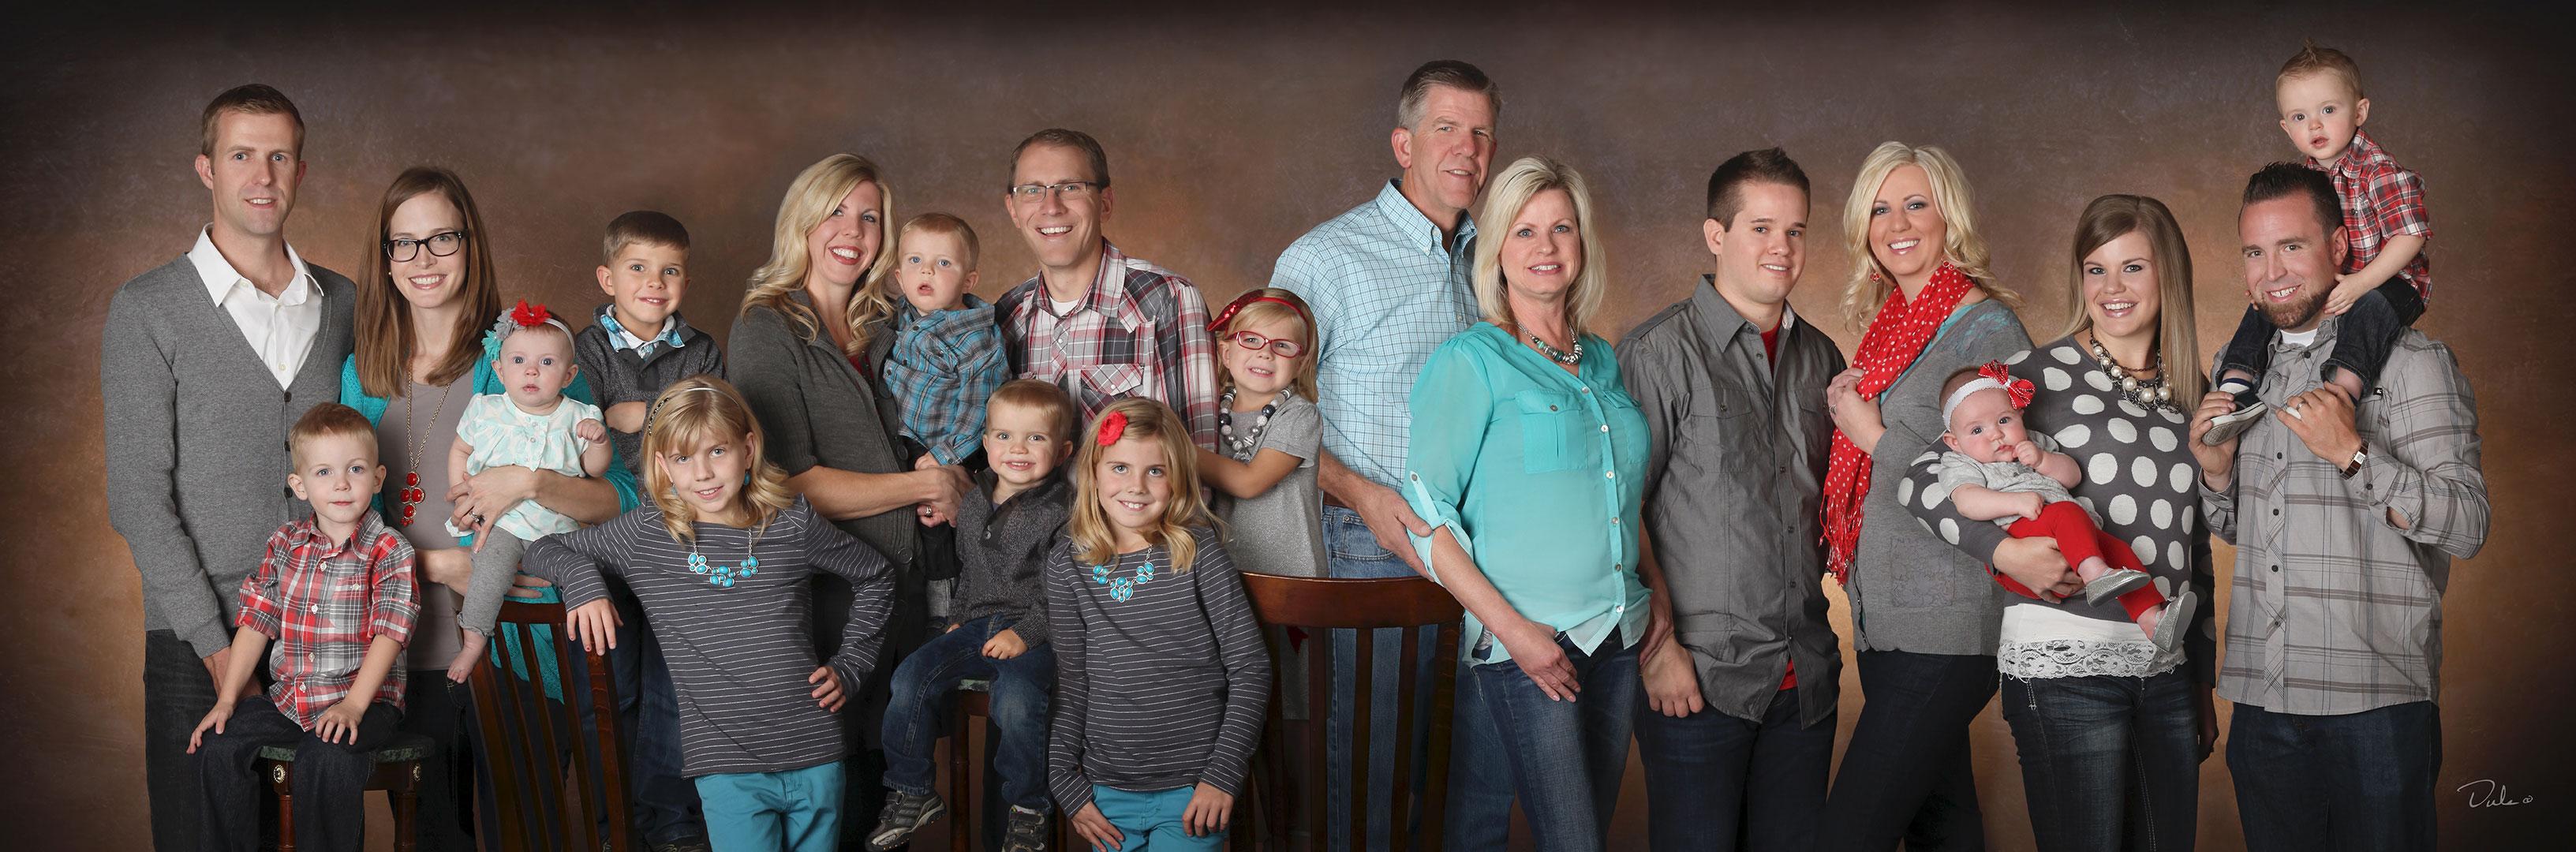 Family Panoramic Art Tempe